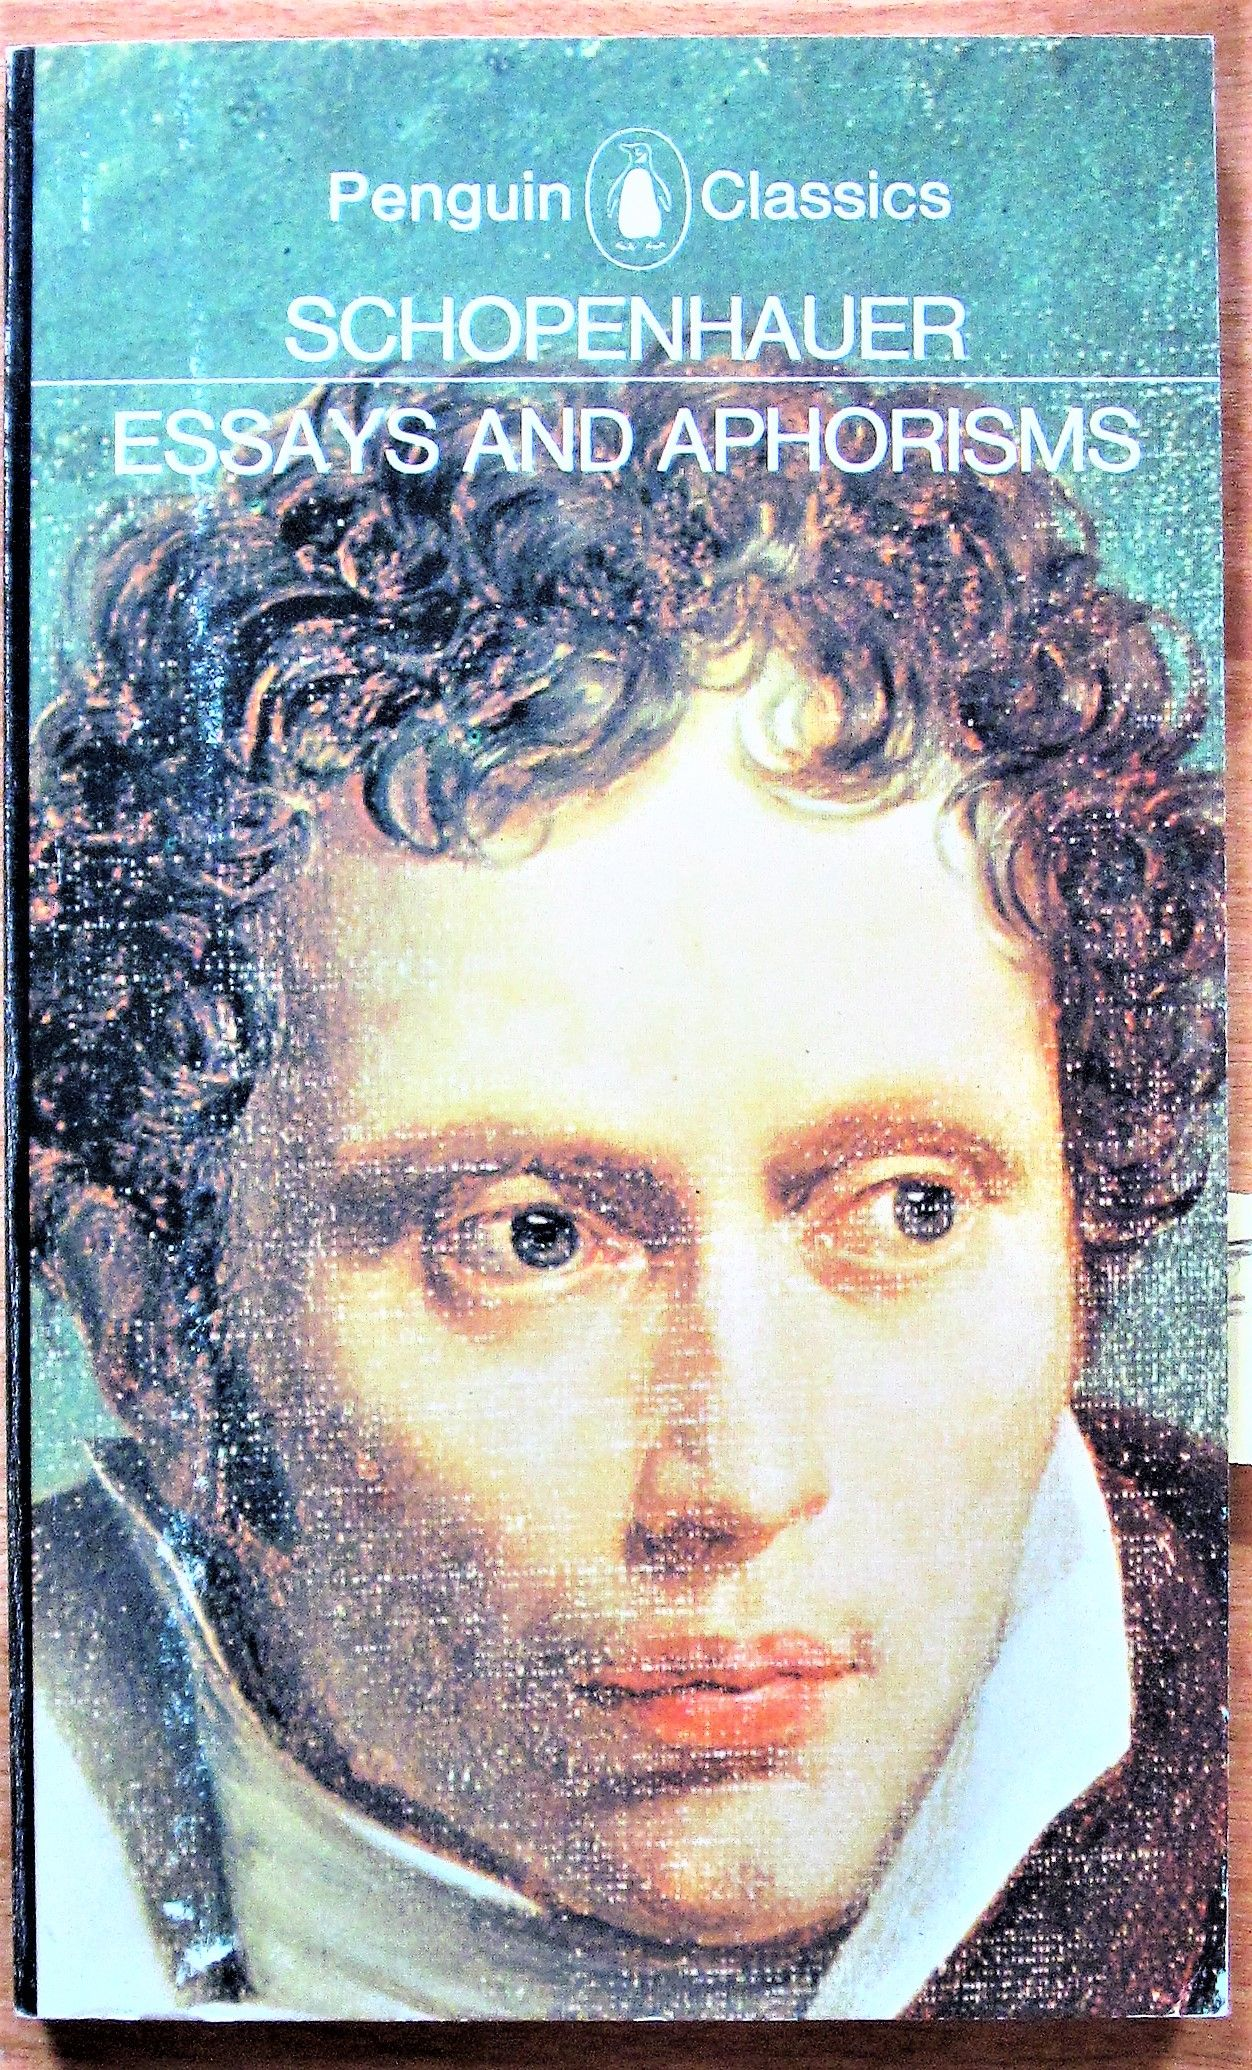 003 Essays And Aphorisms X Essay Frightening By Arthur Schopenhauer Pdf Full